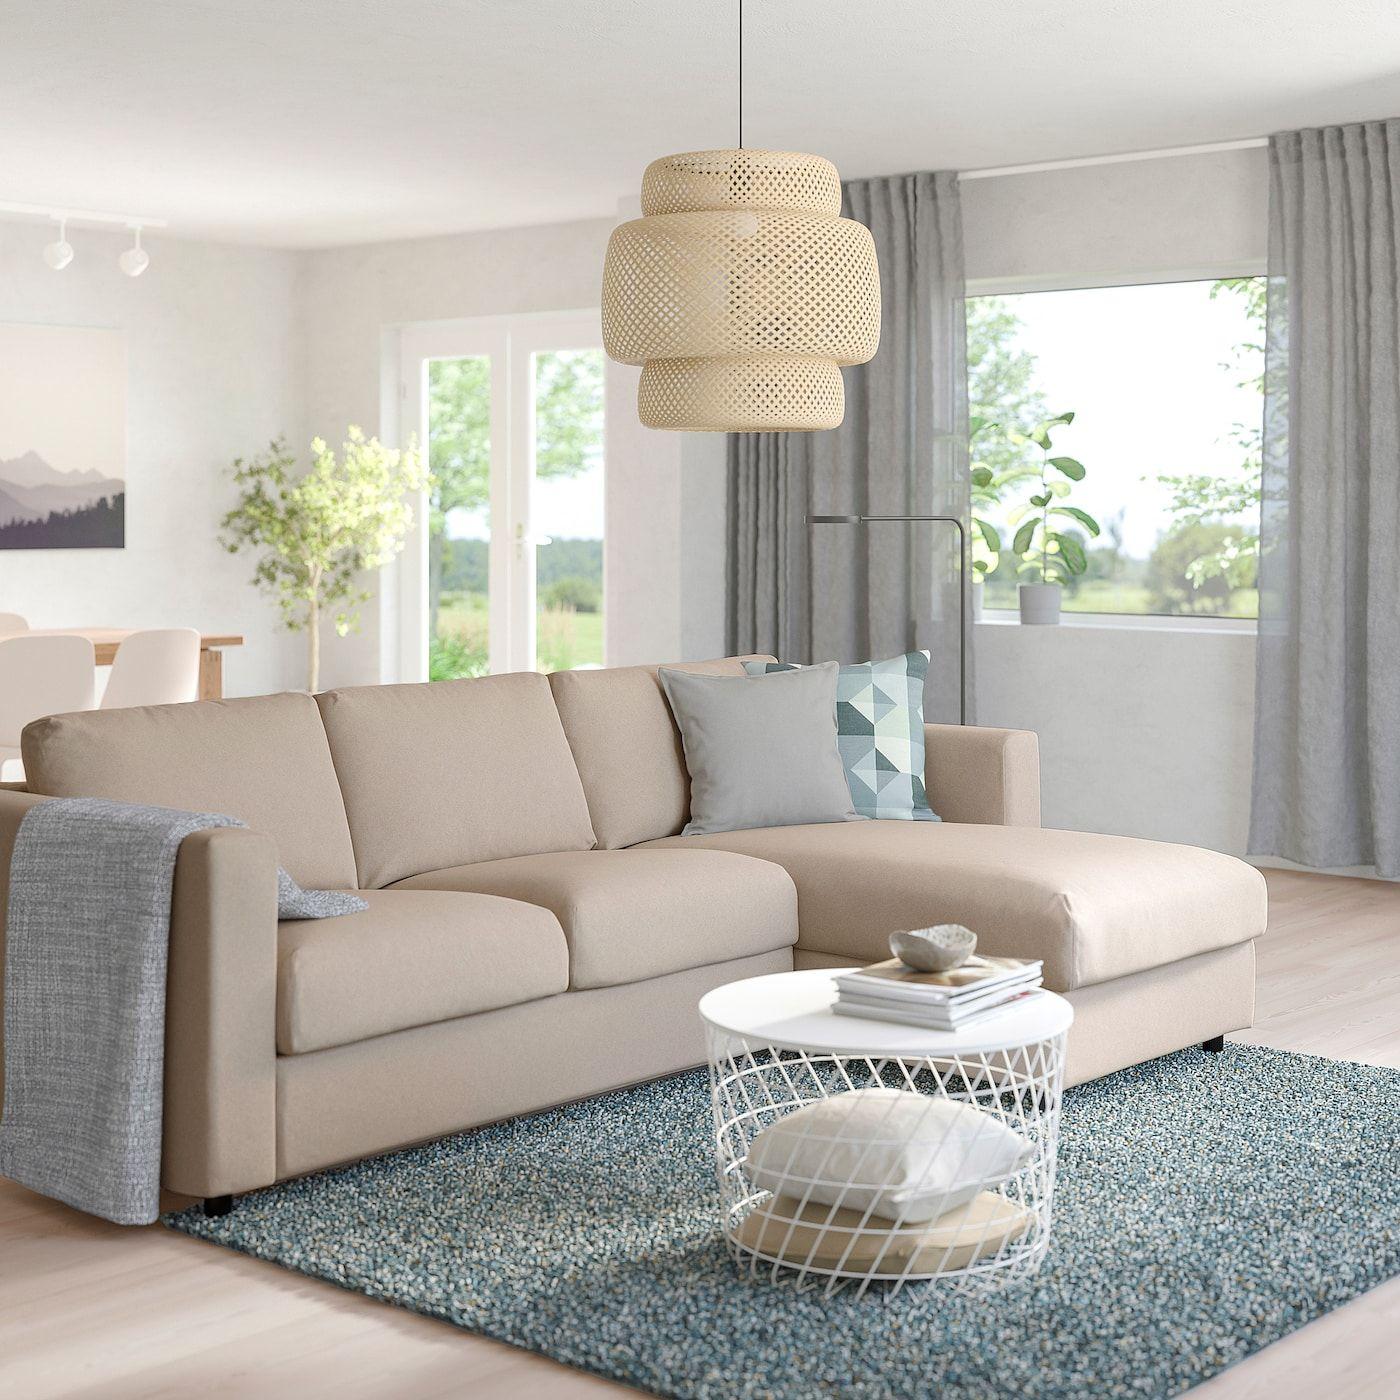 IKEA FINNALA Sofabed in 2020 Corner sofa bed, Sofa